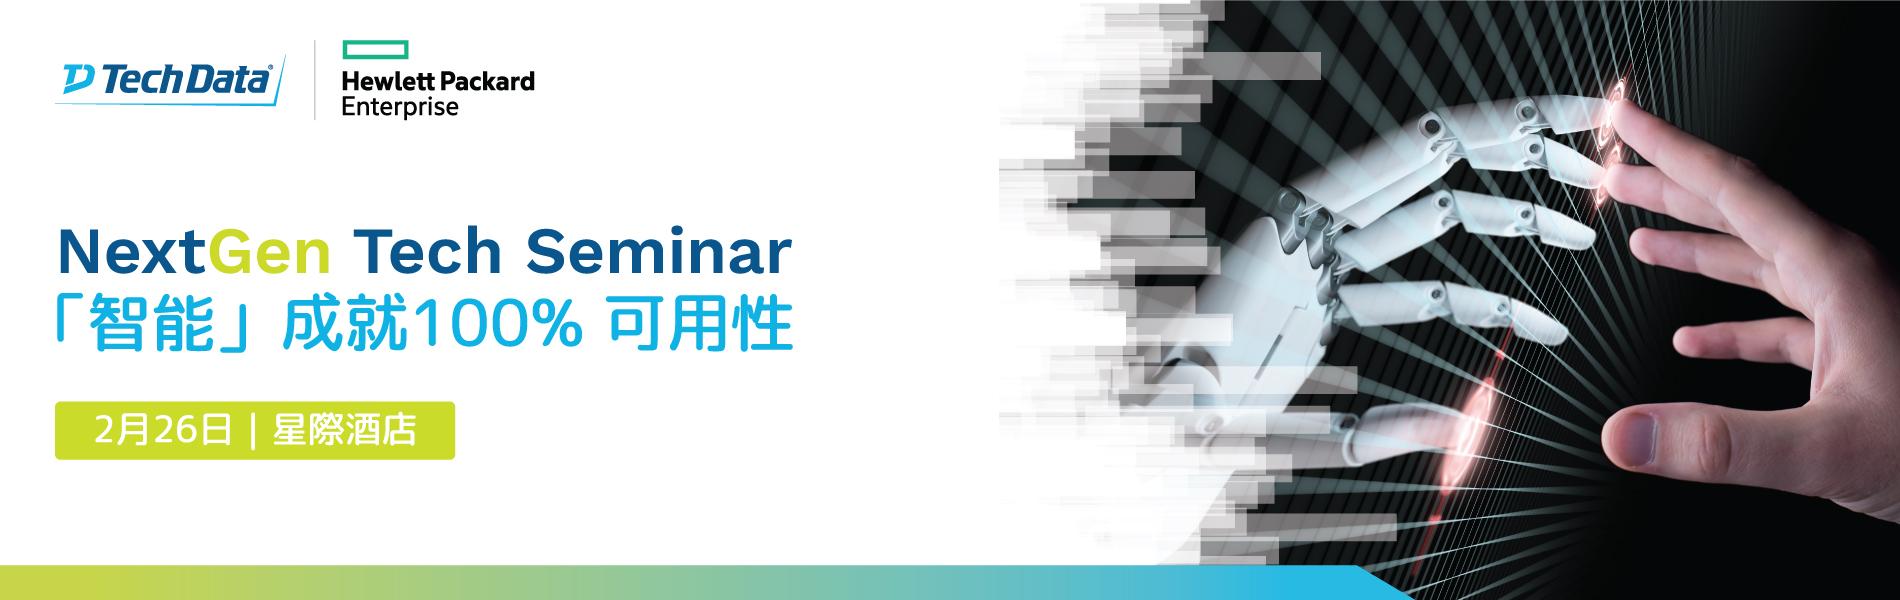 NextGen Tech Seminar |「智能」成就100% 可用性